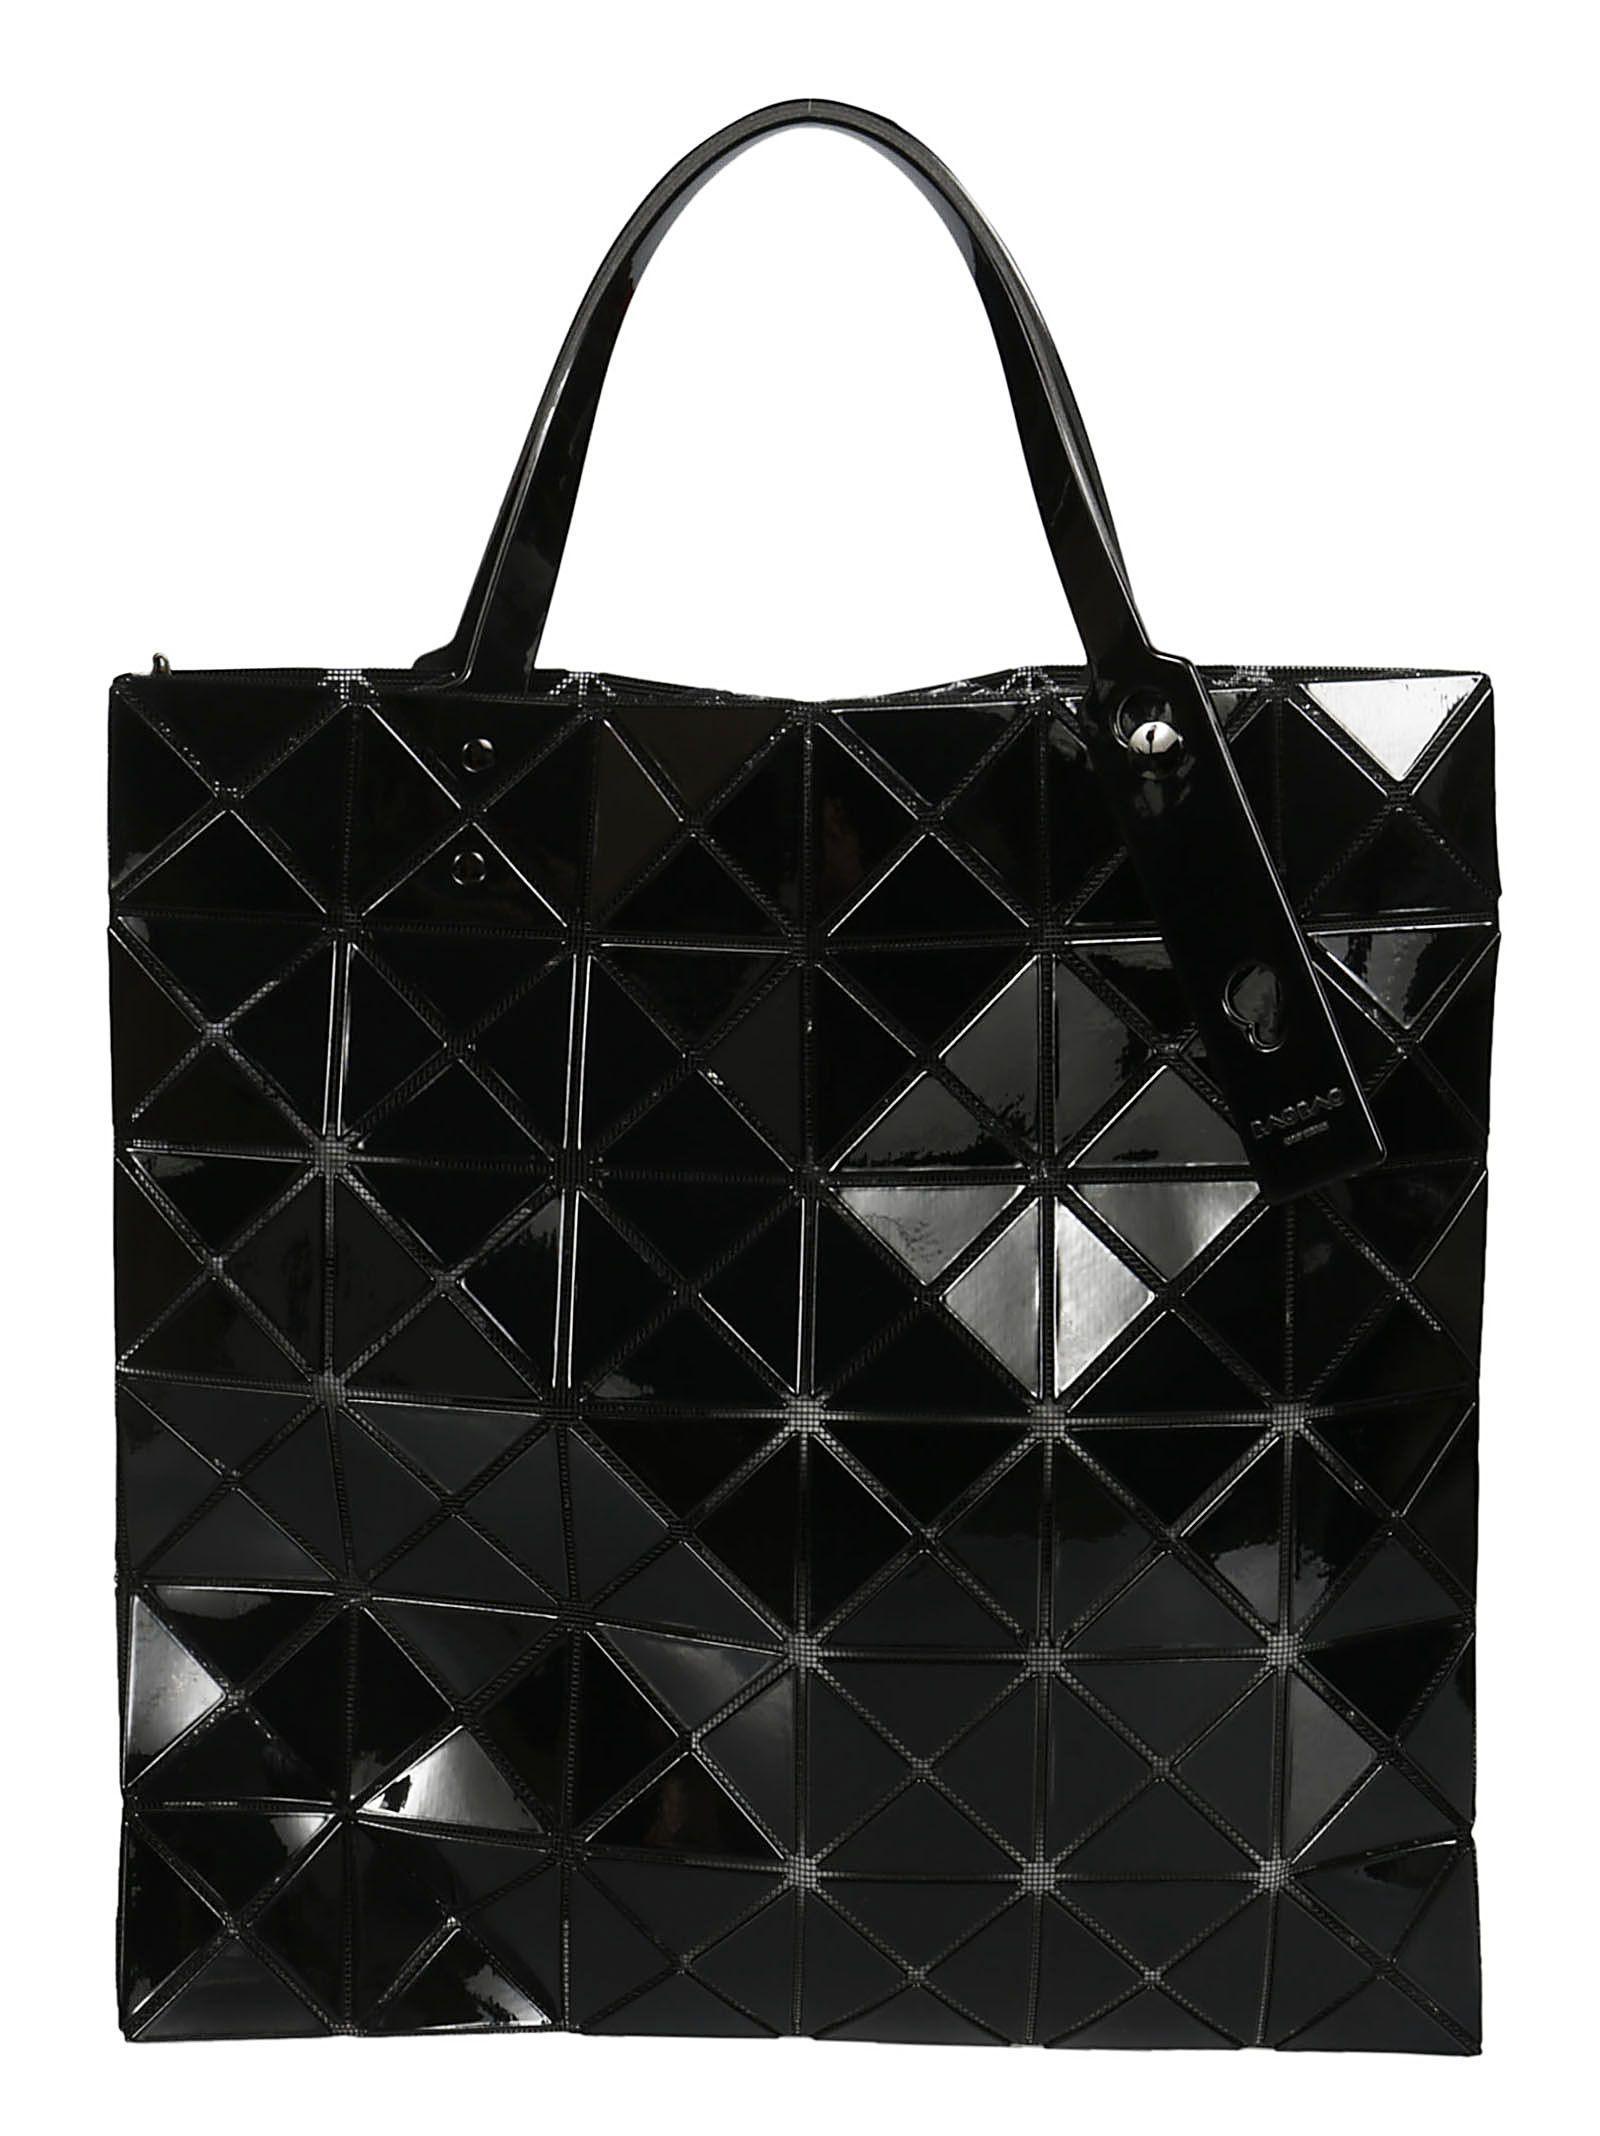 Bao Bao Issey Miyake Prism Tote In Black